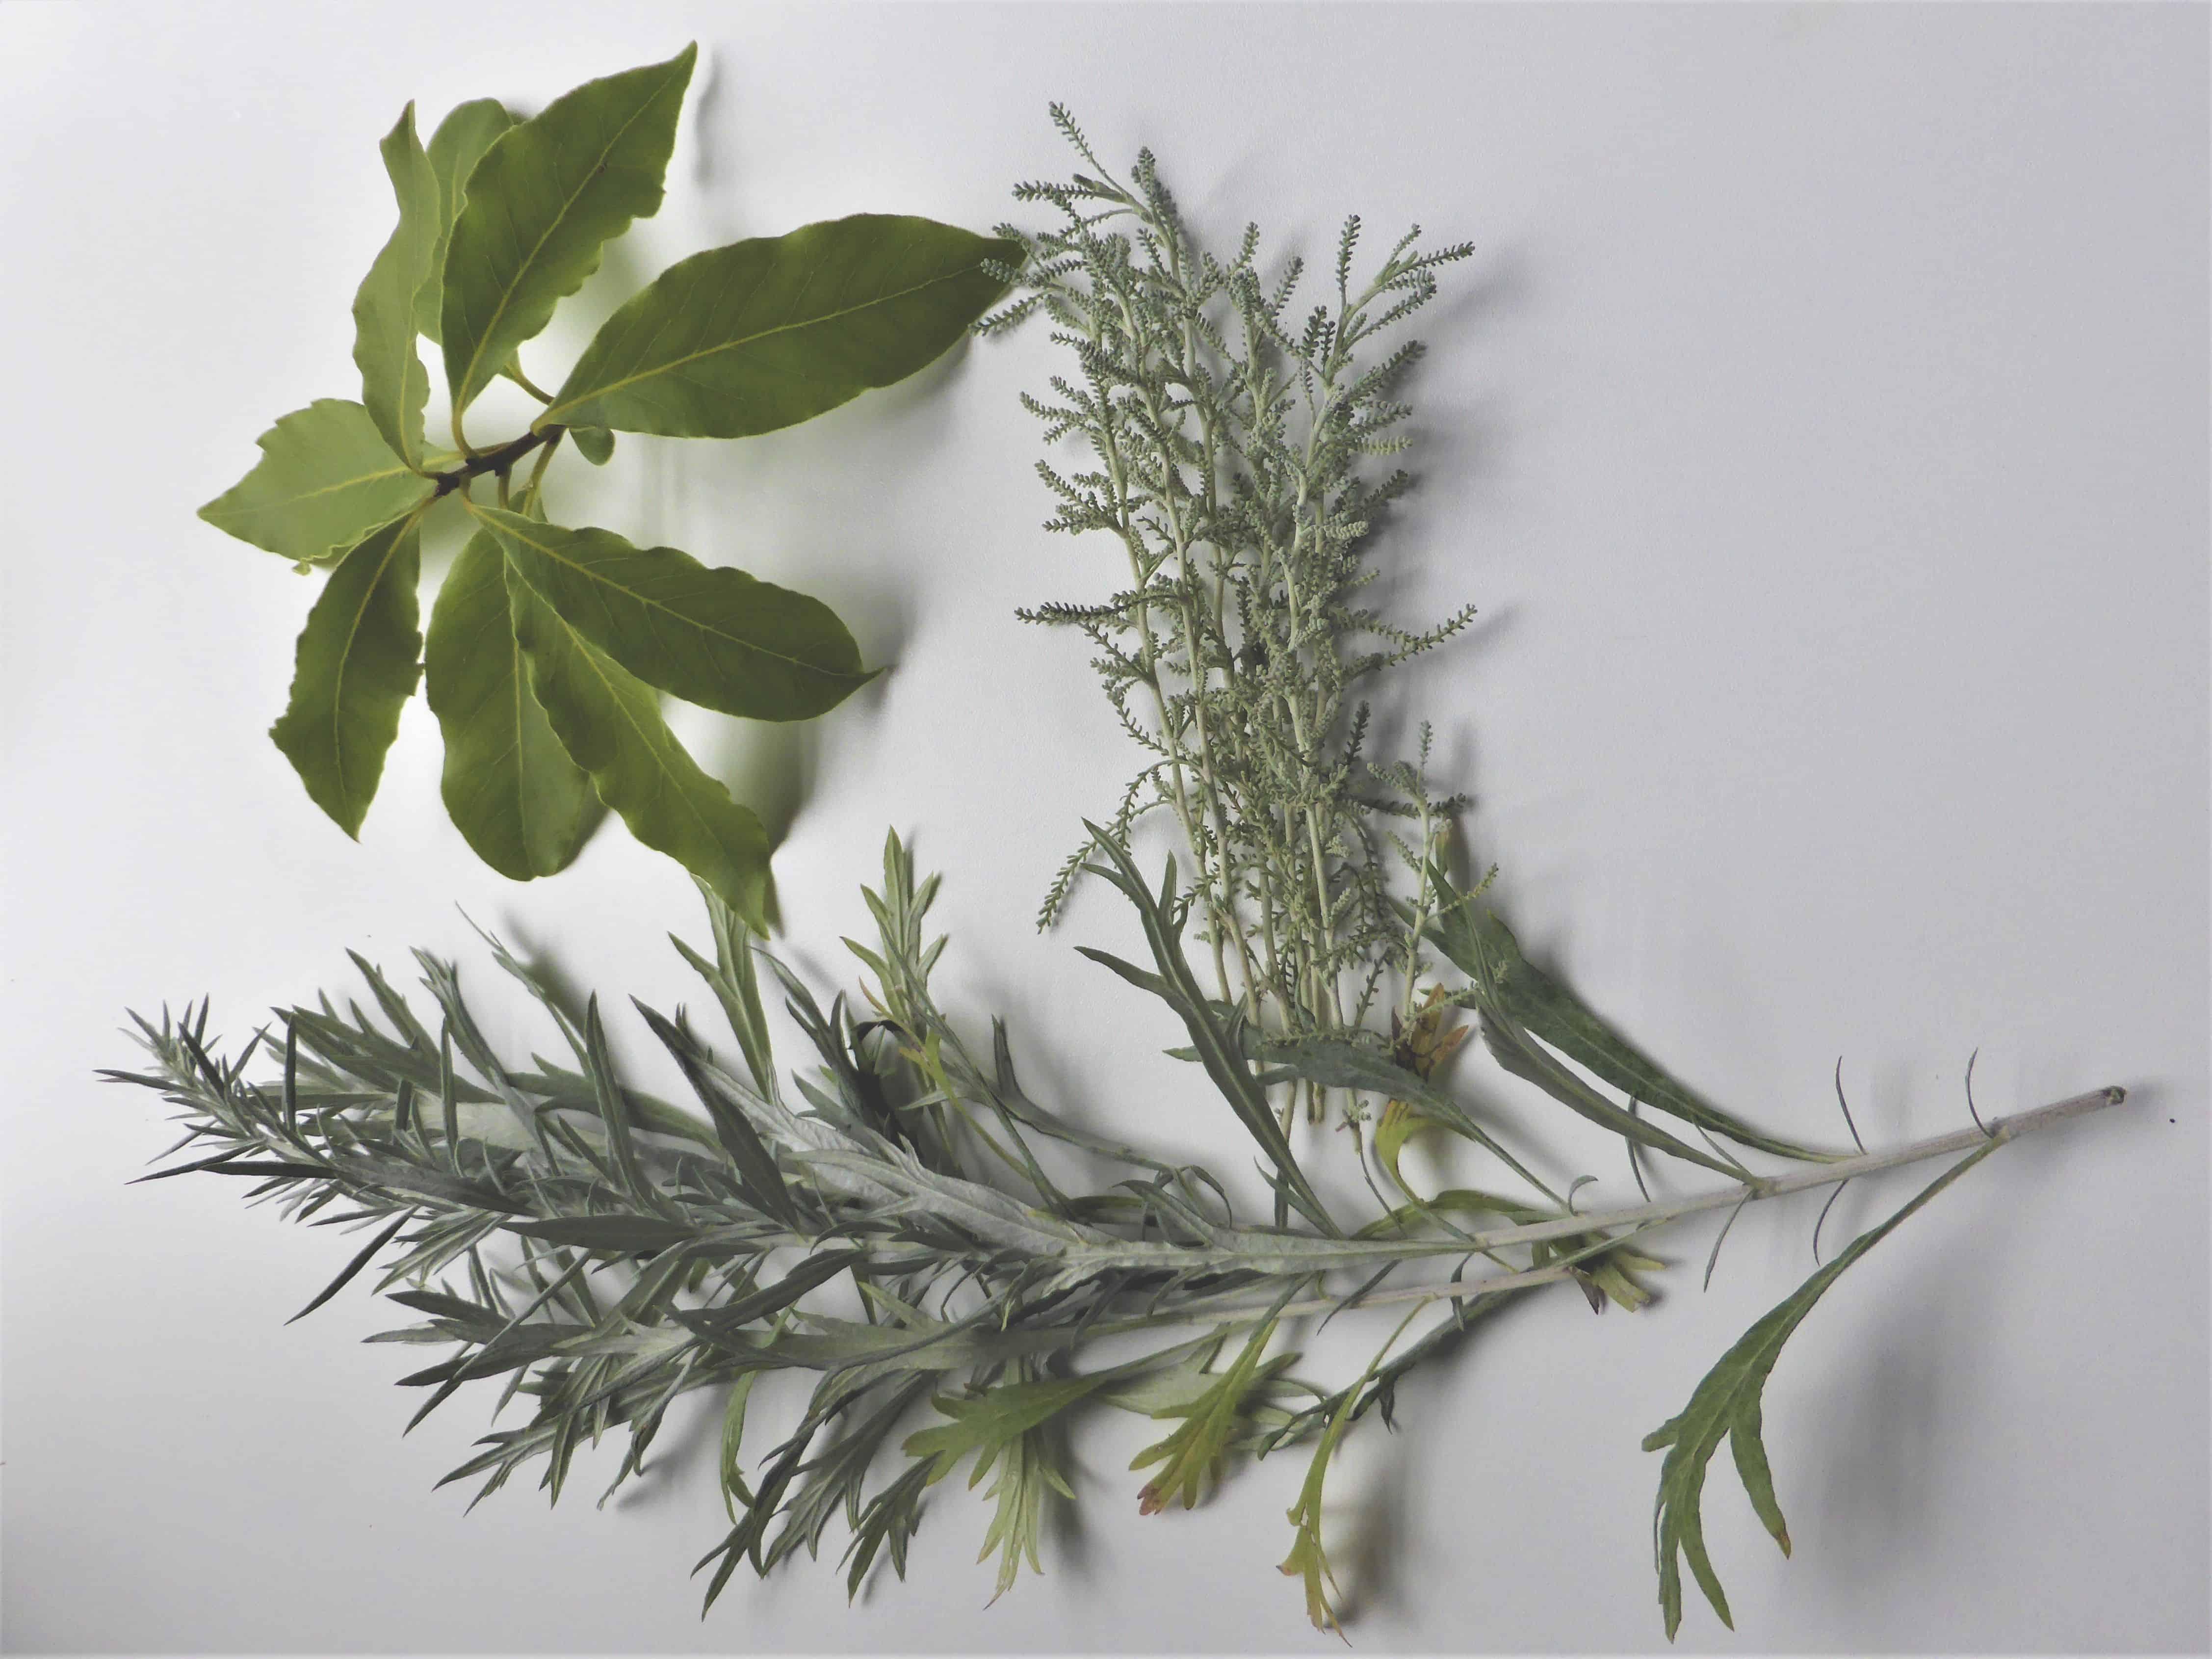 Artemisia, Santolina und Lorbeer